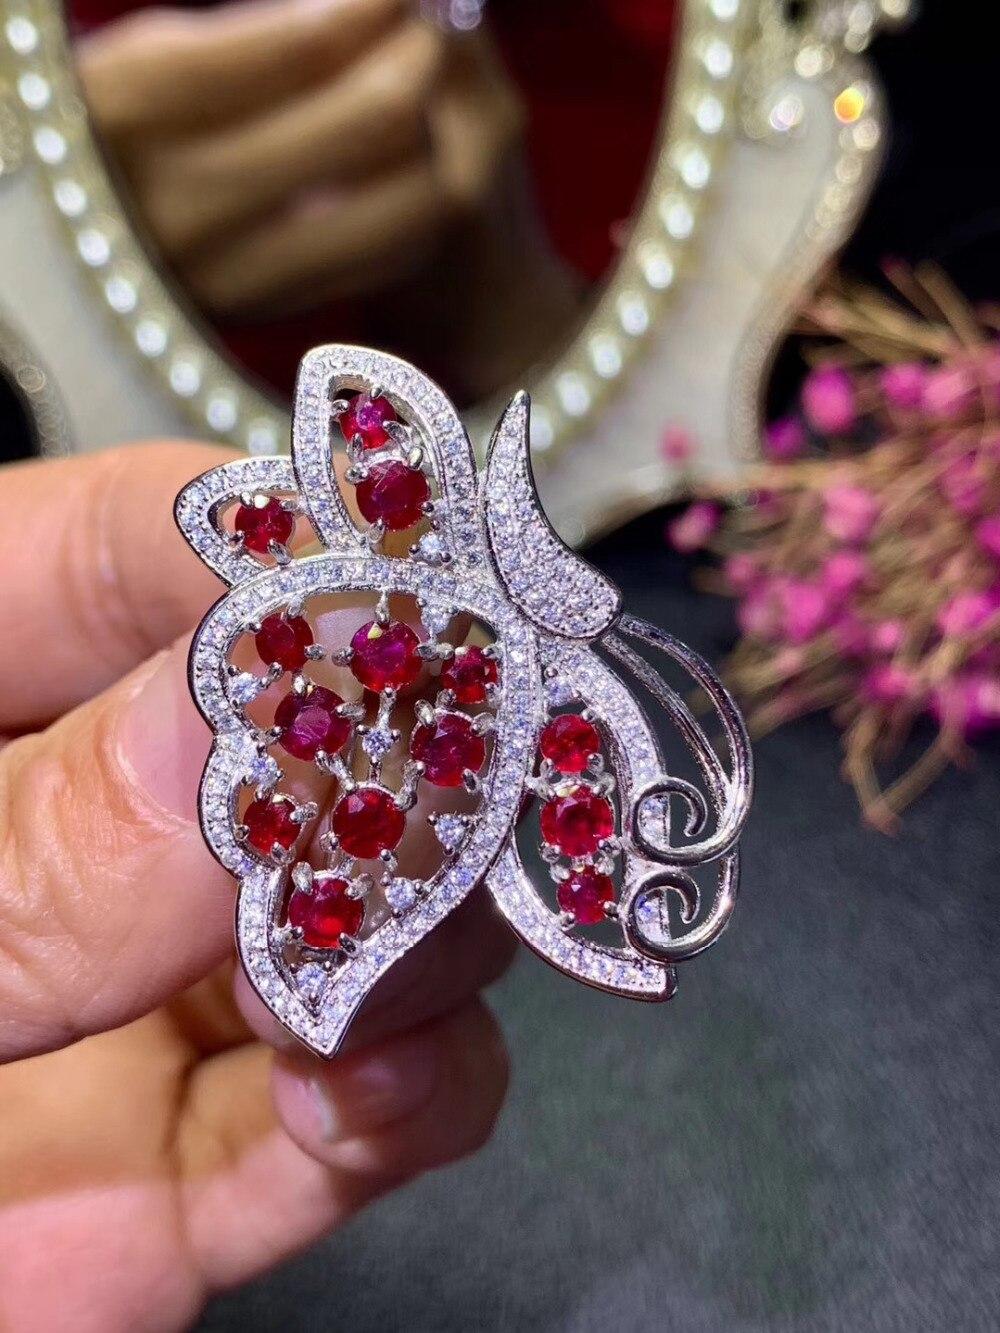 Broches de GEMA de rubí rojo Natural colgante S925 broches de piedras preciosas naturales de plata moda grace mariposa novia boda joyería - 2